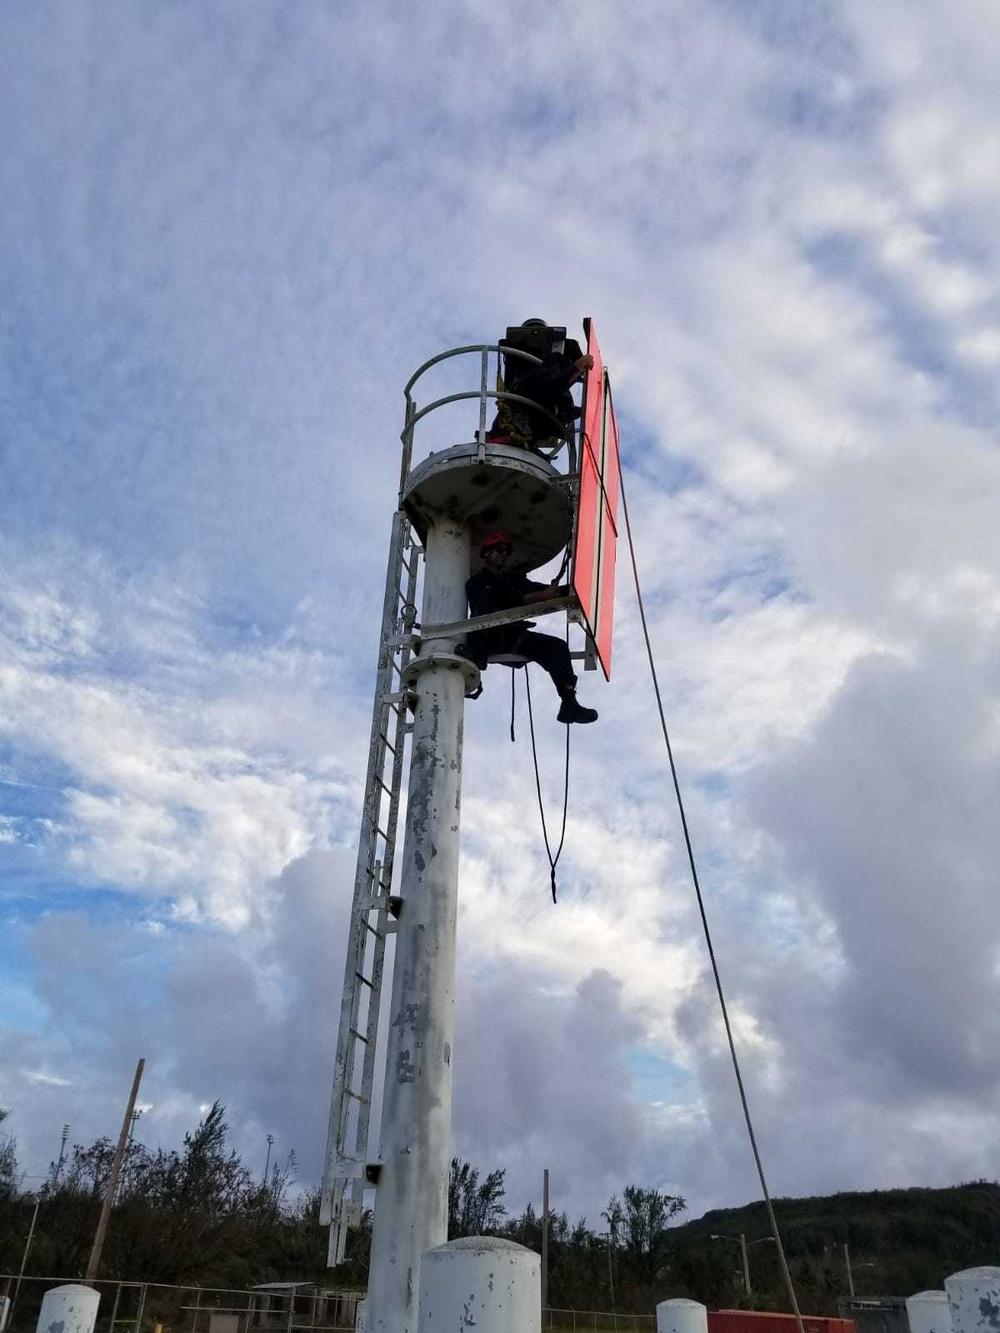 U.S. Coast Guard Cutter Sequoia: after Typhoon Mangkut